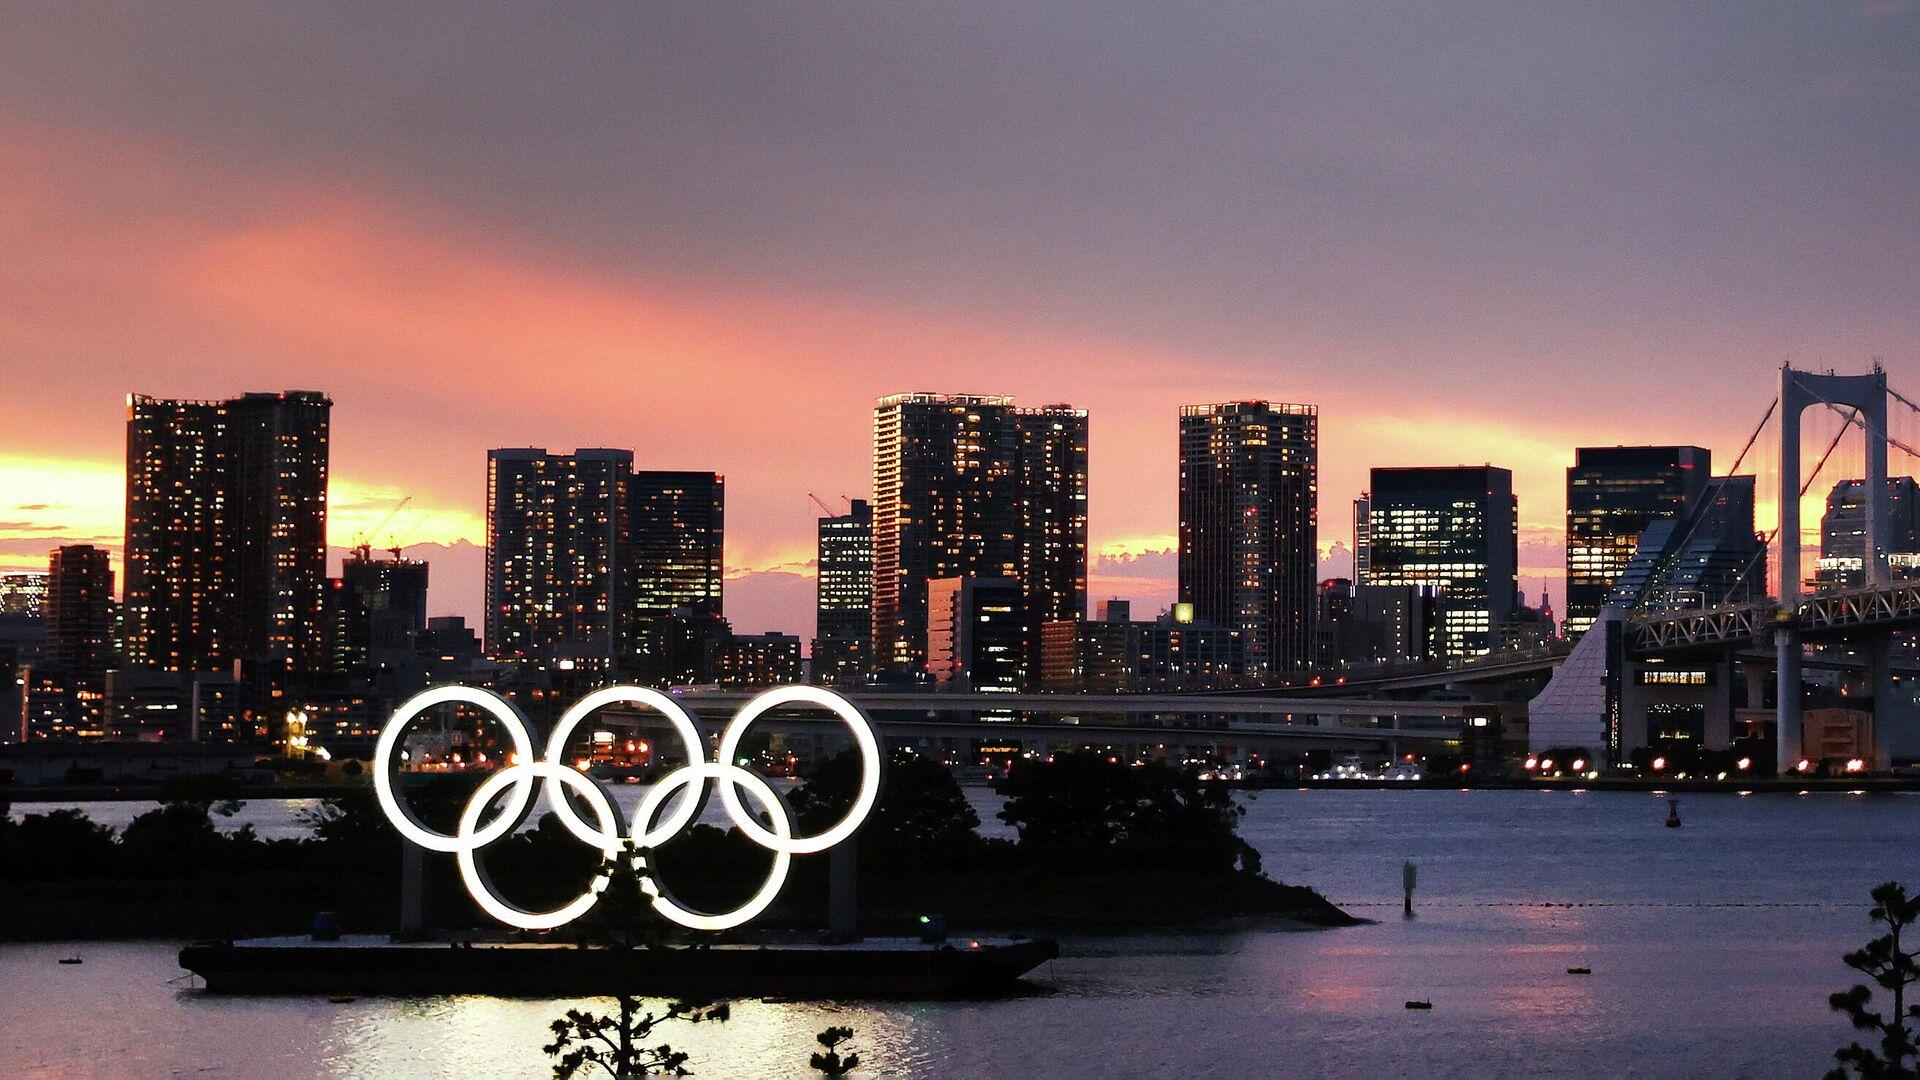 Олимпийские кольца в Токио - РИА Новости, 1920, 21.07.2021